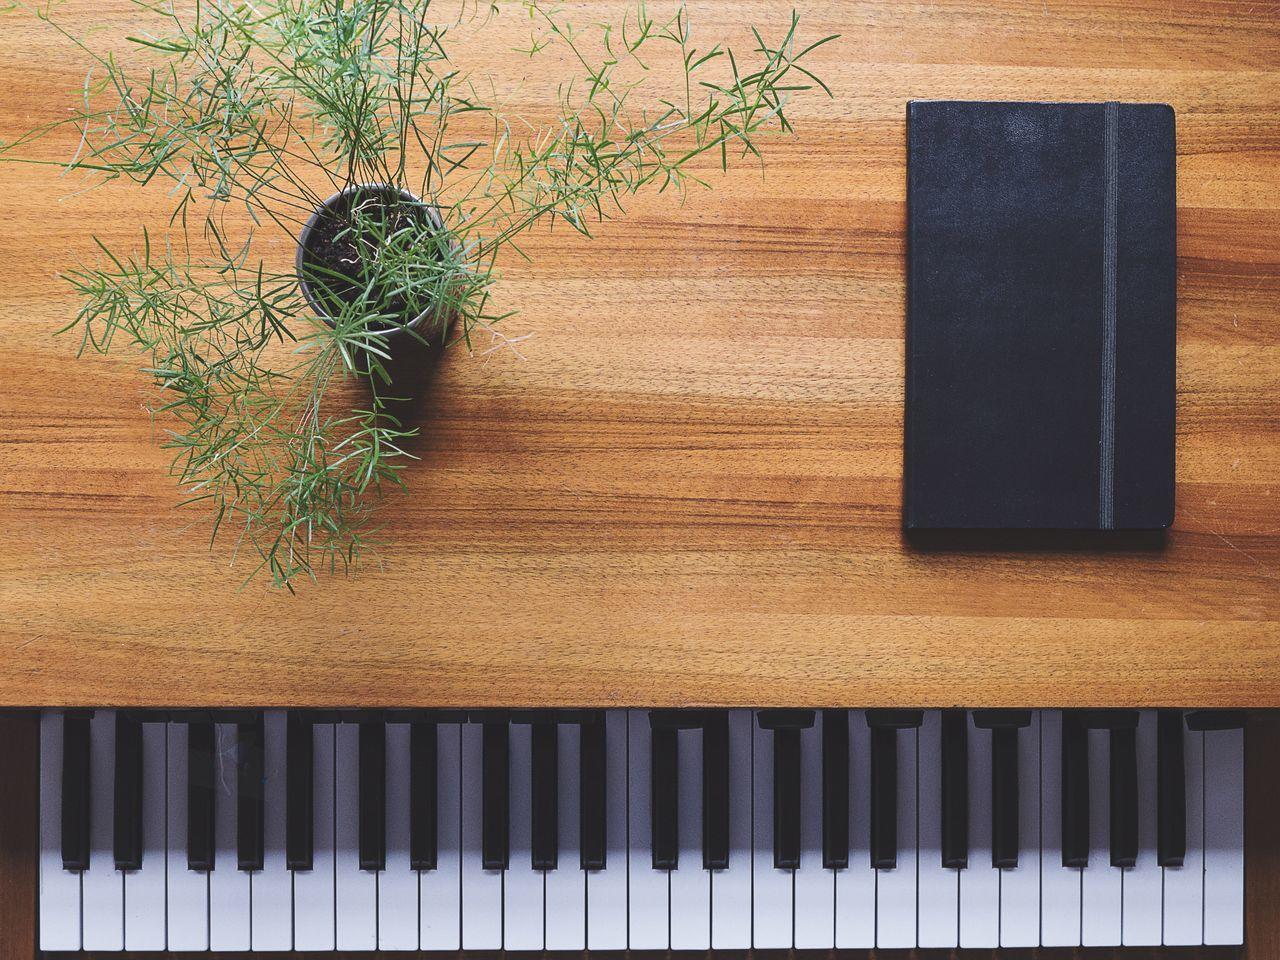 TakeoverMusic Piano keyboard philicorda zen Piano Moments